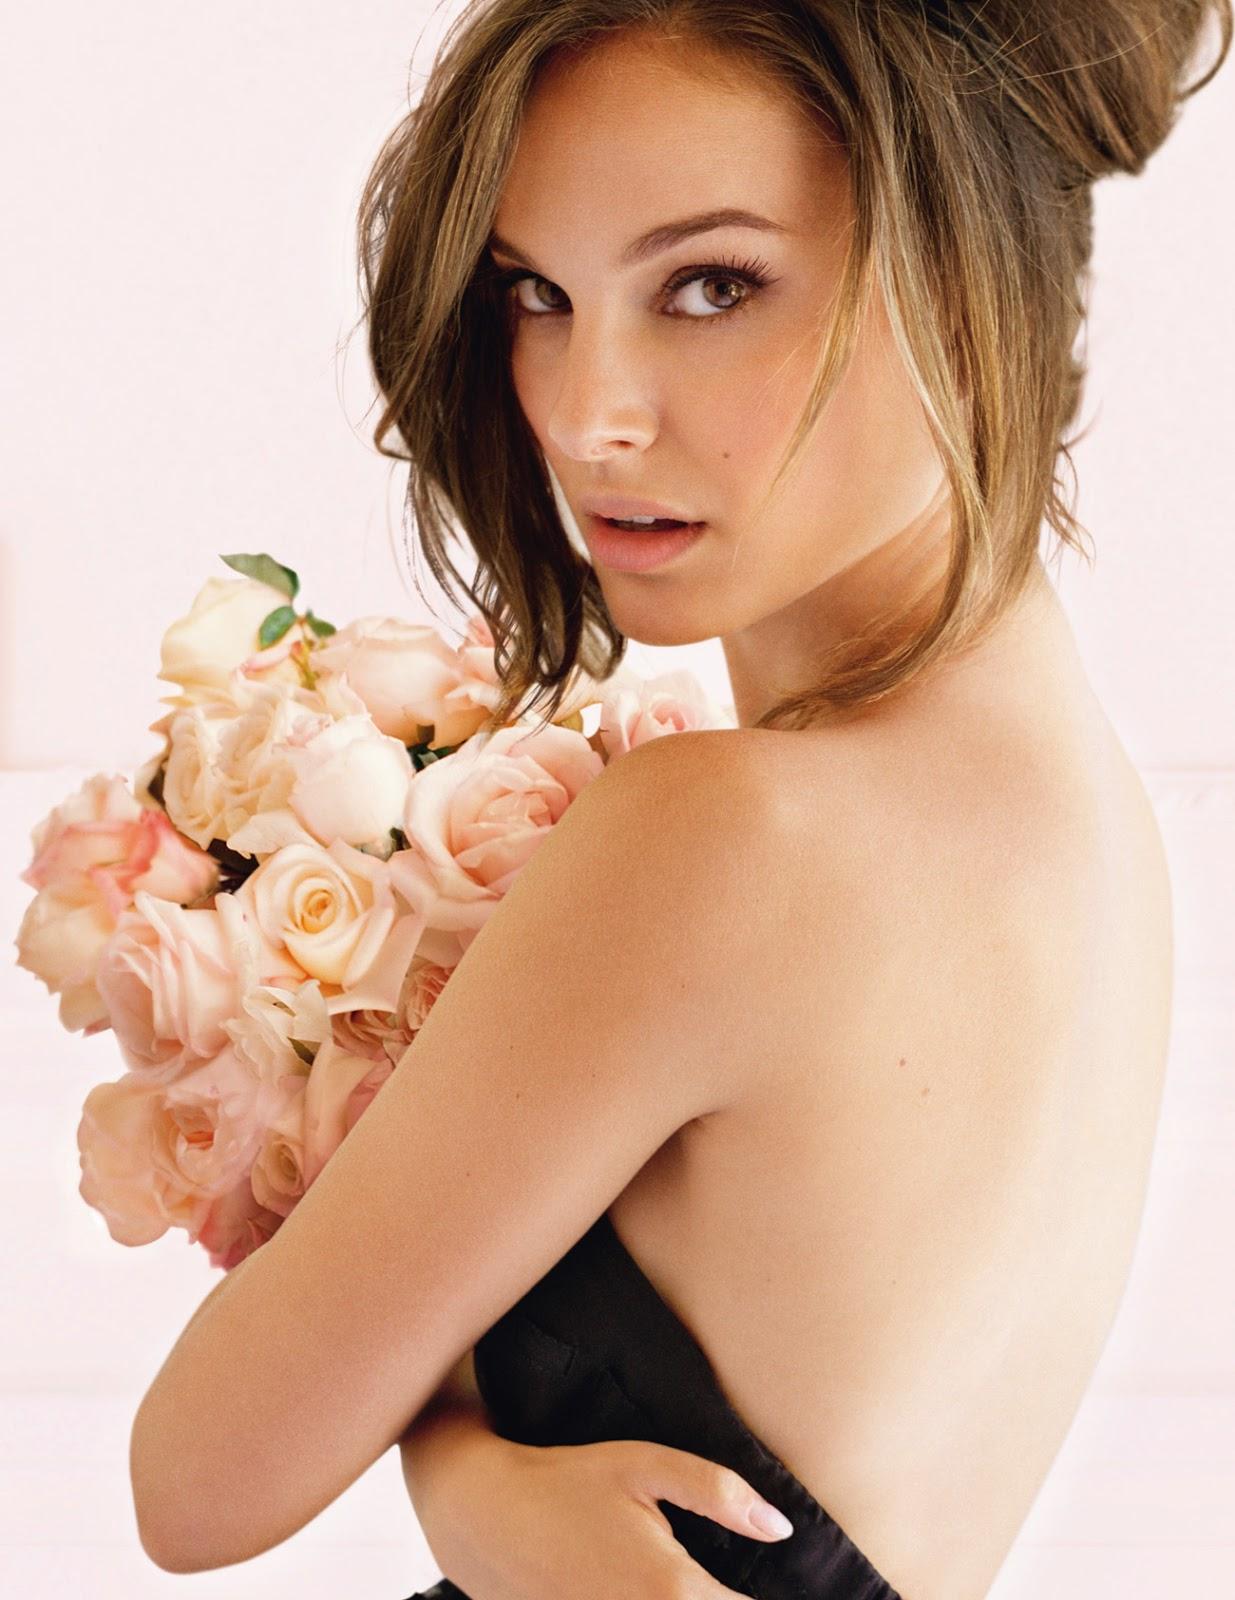 http://4.bp.blogspot.com/-8LpWsg1eu_0/UOS5XEvGFFI/AAAAAAAAKps/QCUupi_mlAw/s1600/Miss-Dior-Add-Photoshoot-natalie-portman-31942395-1300-1684.jpg